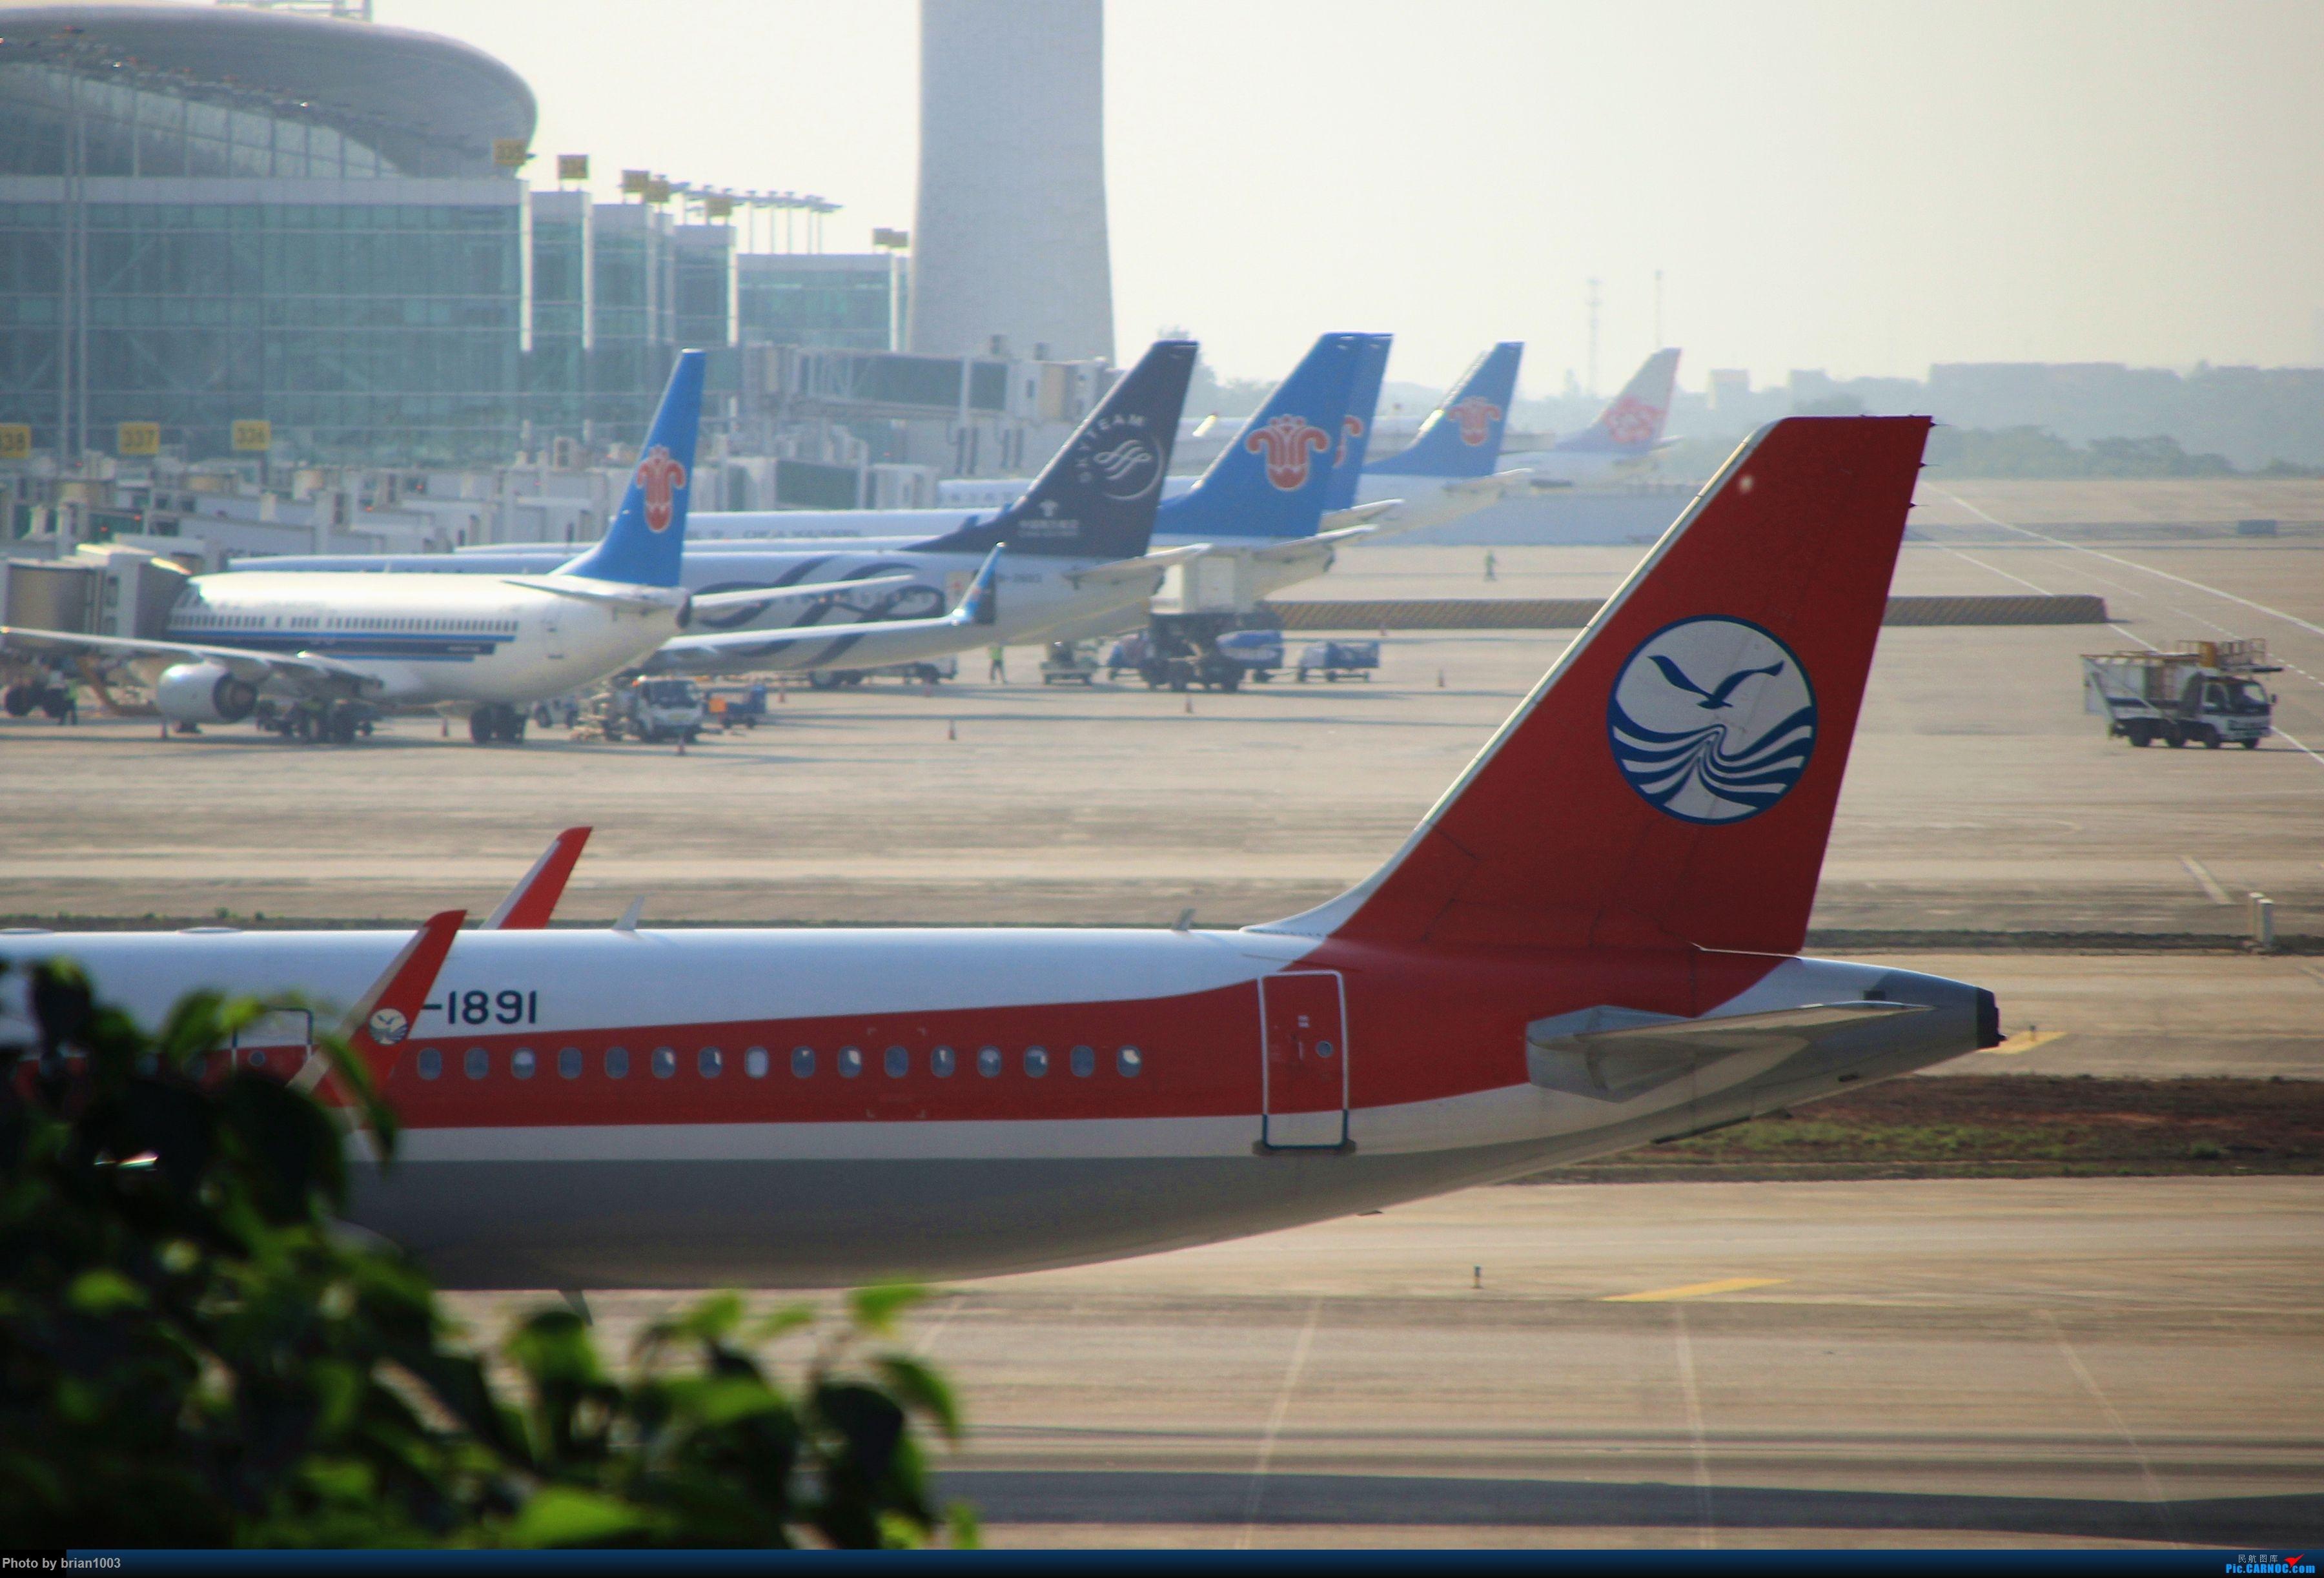 Re:[原创]WUH武汉天河机场拍机之喜迎酷航788和偶遇某其他飞机 AIRBUS A321-200 B-1891 WUH